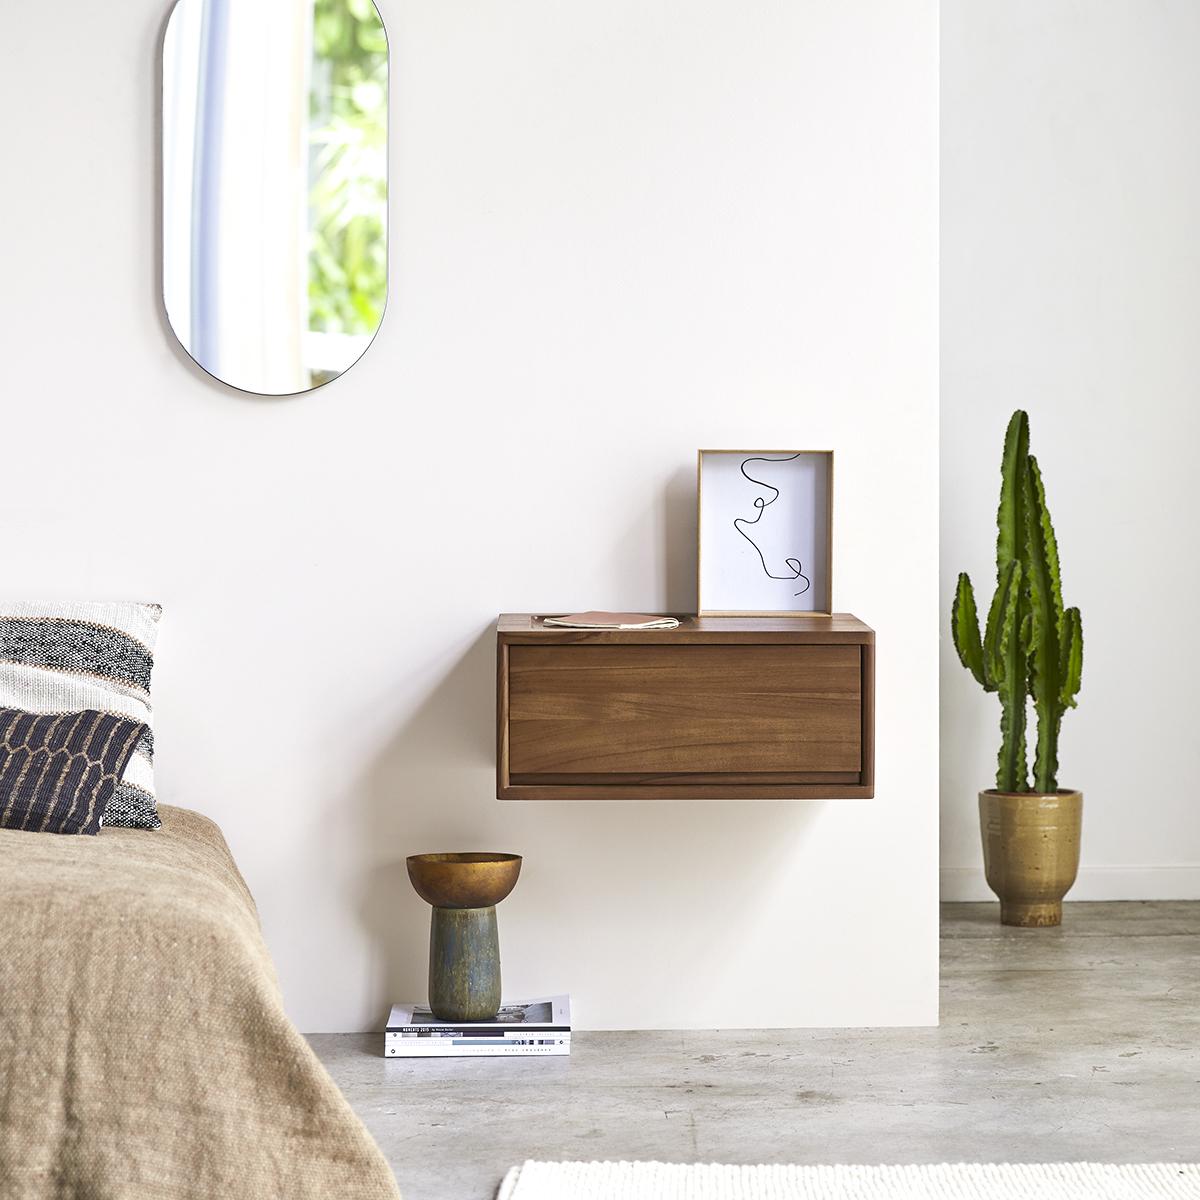 Circa 1-drawer solid teak Bedside table